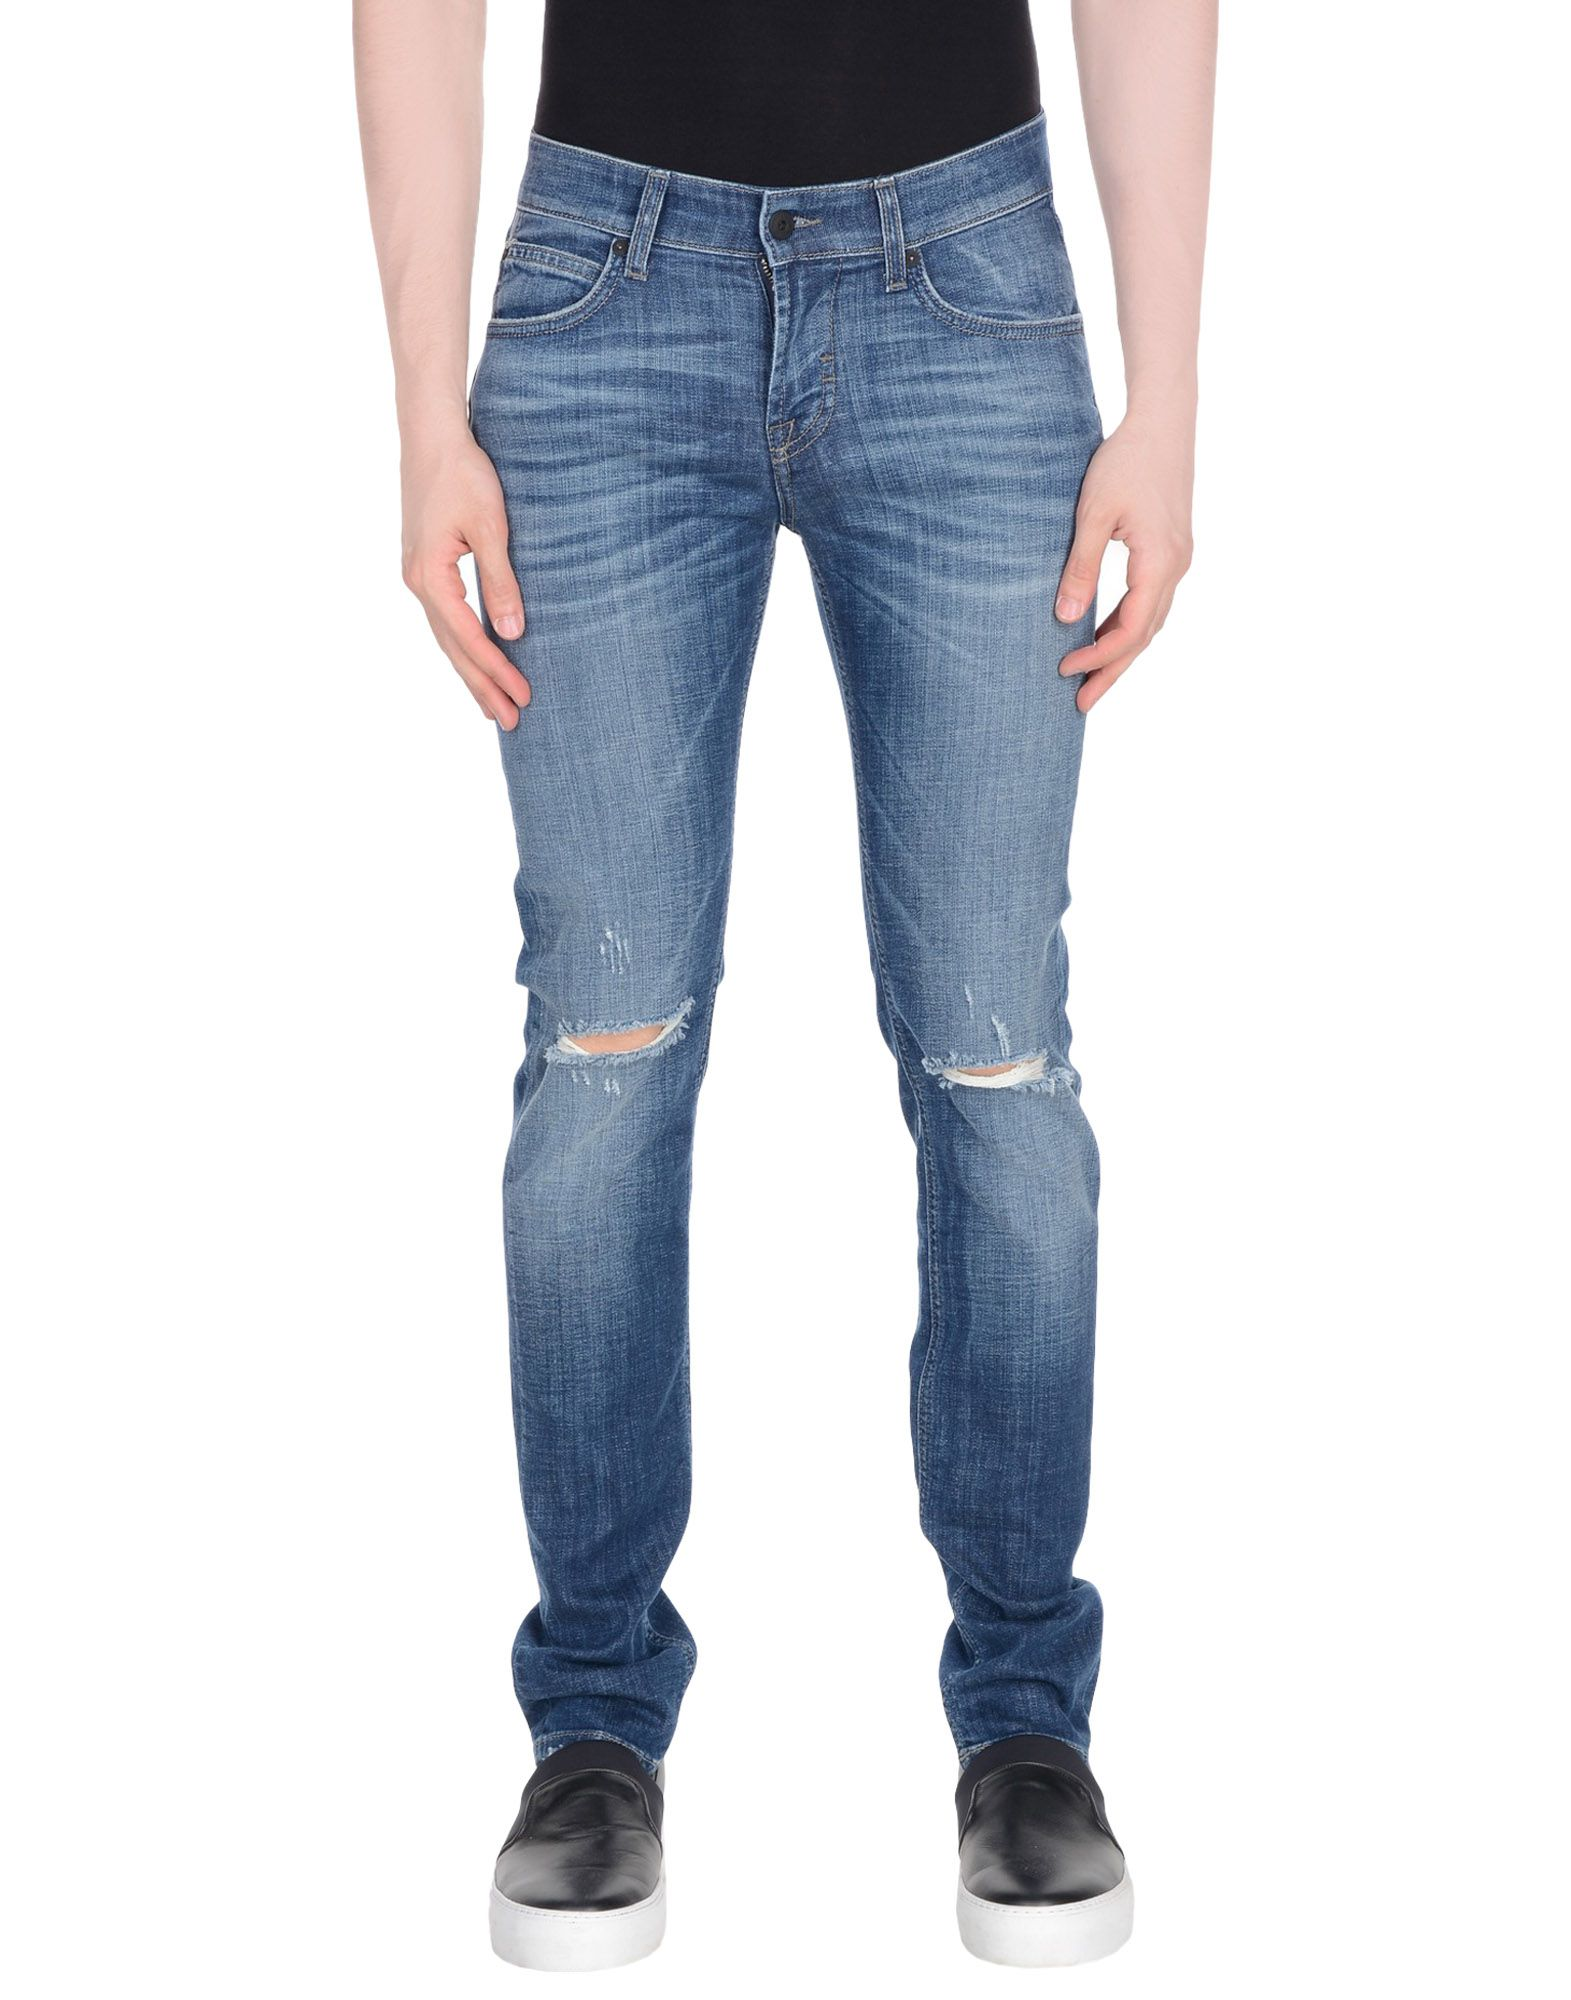 Pantaloni Jeans Ro  Roger's De Luxe - Uomo - Luxe 42681365XU 6454ee